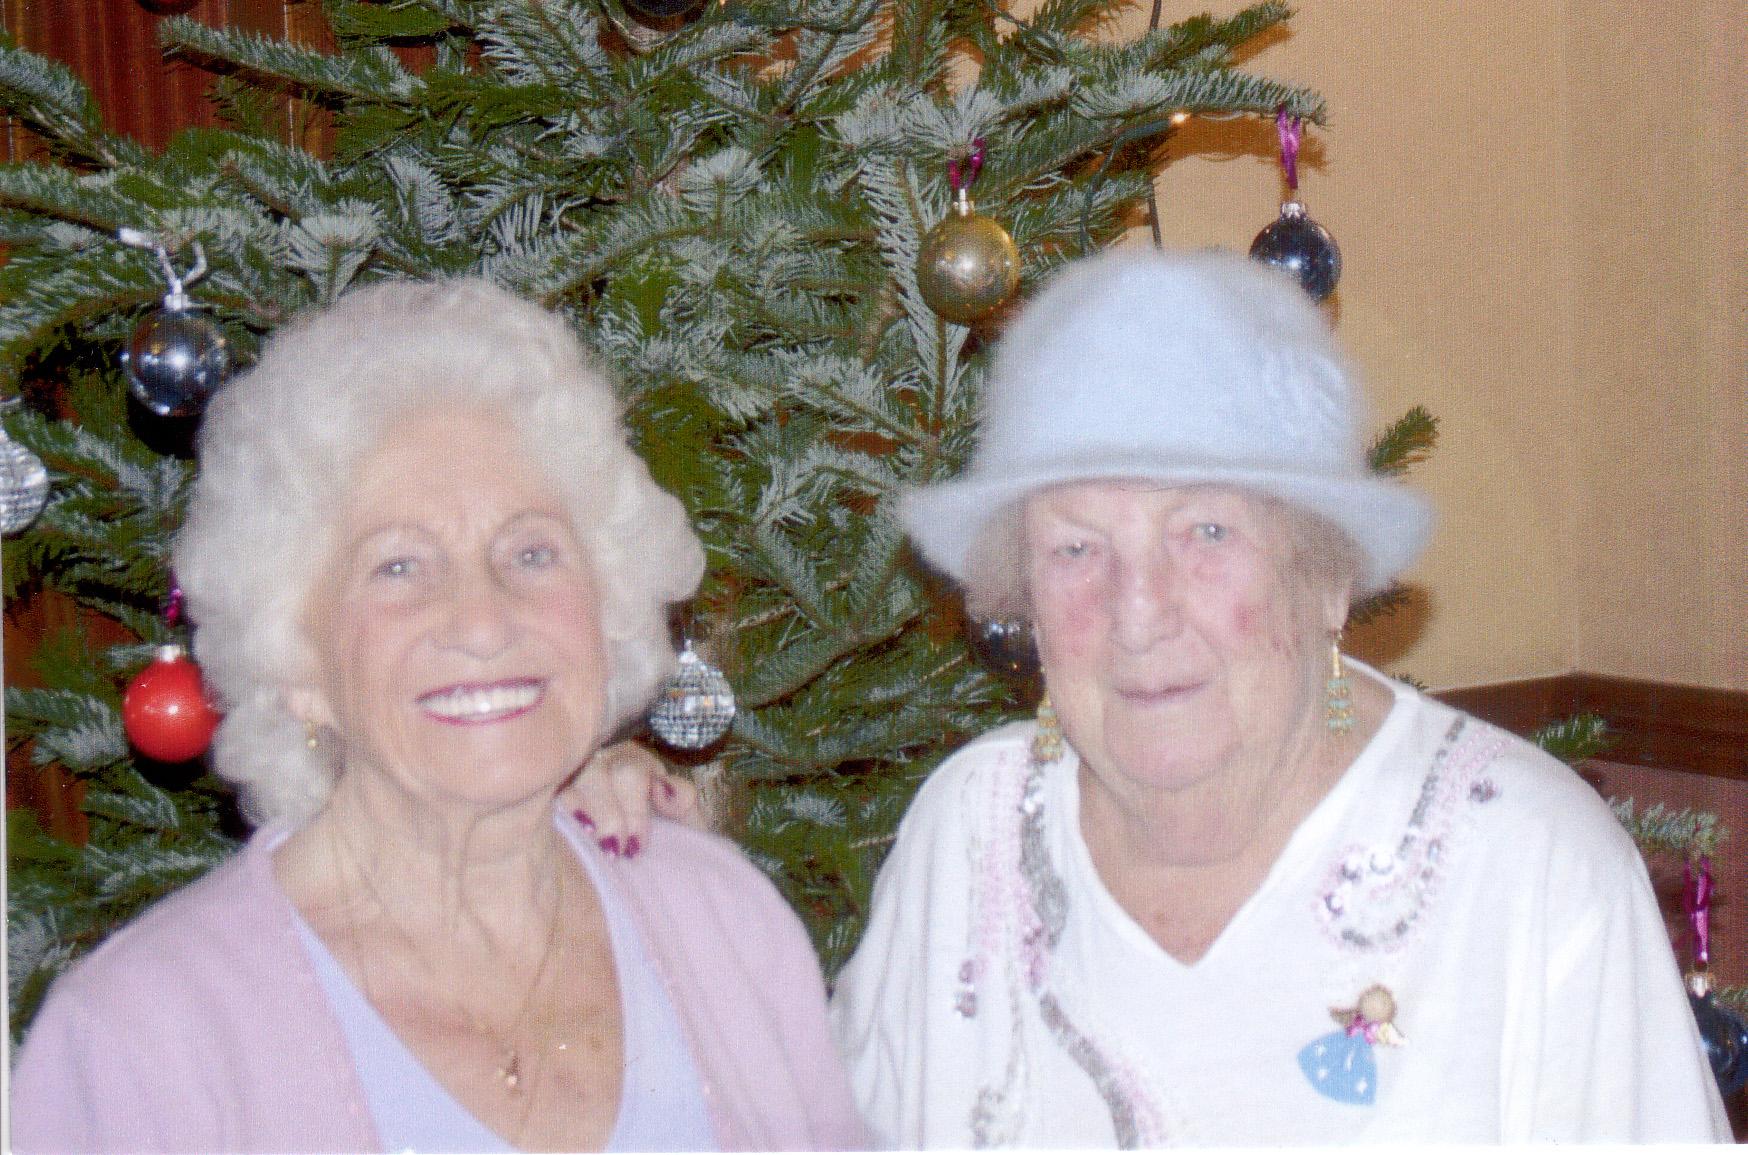 Xmas 2003 mum on right